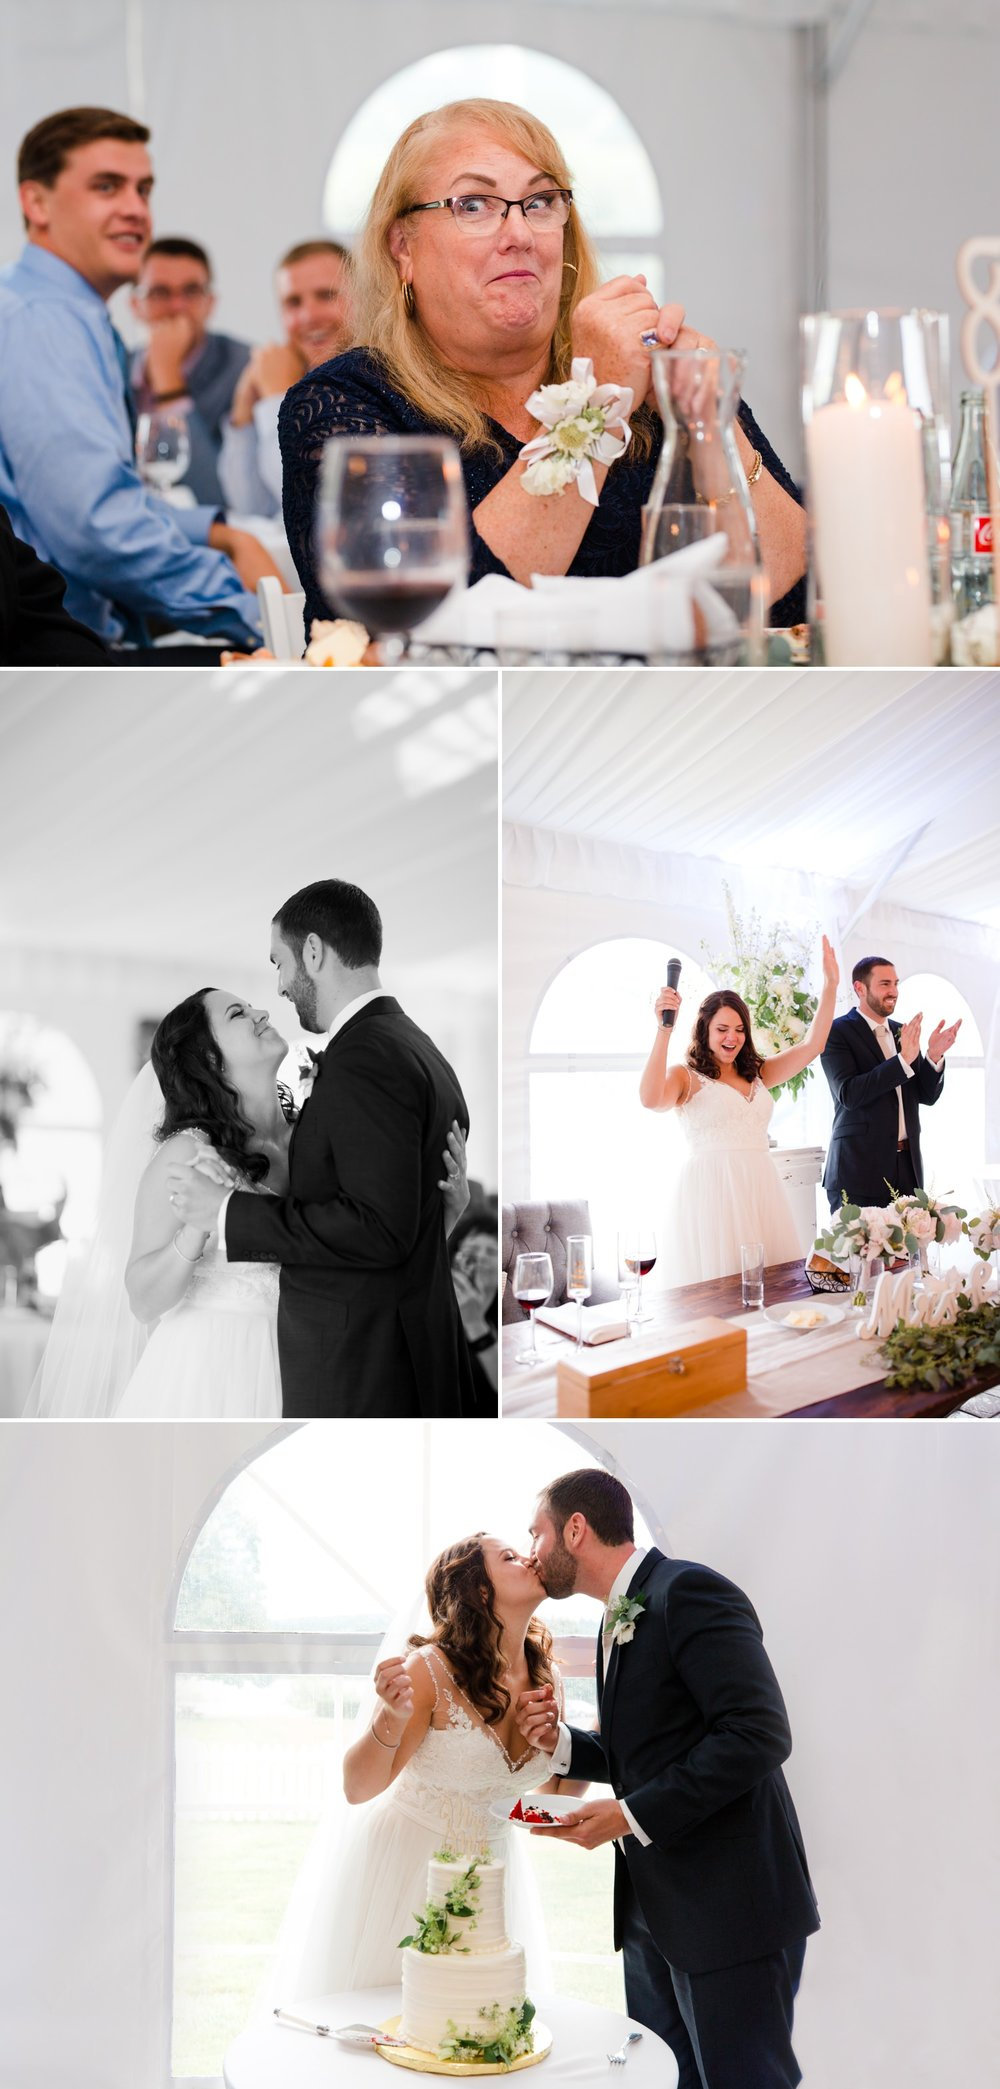 27-seattle-wedding-reception.jpg